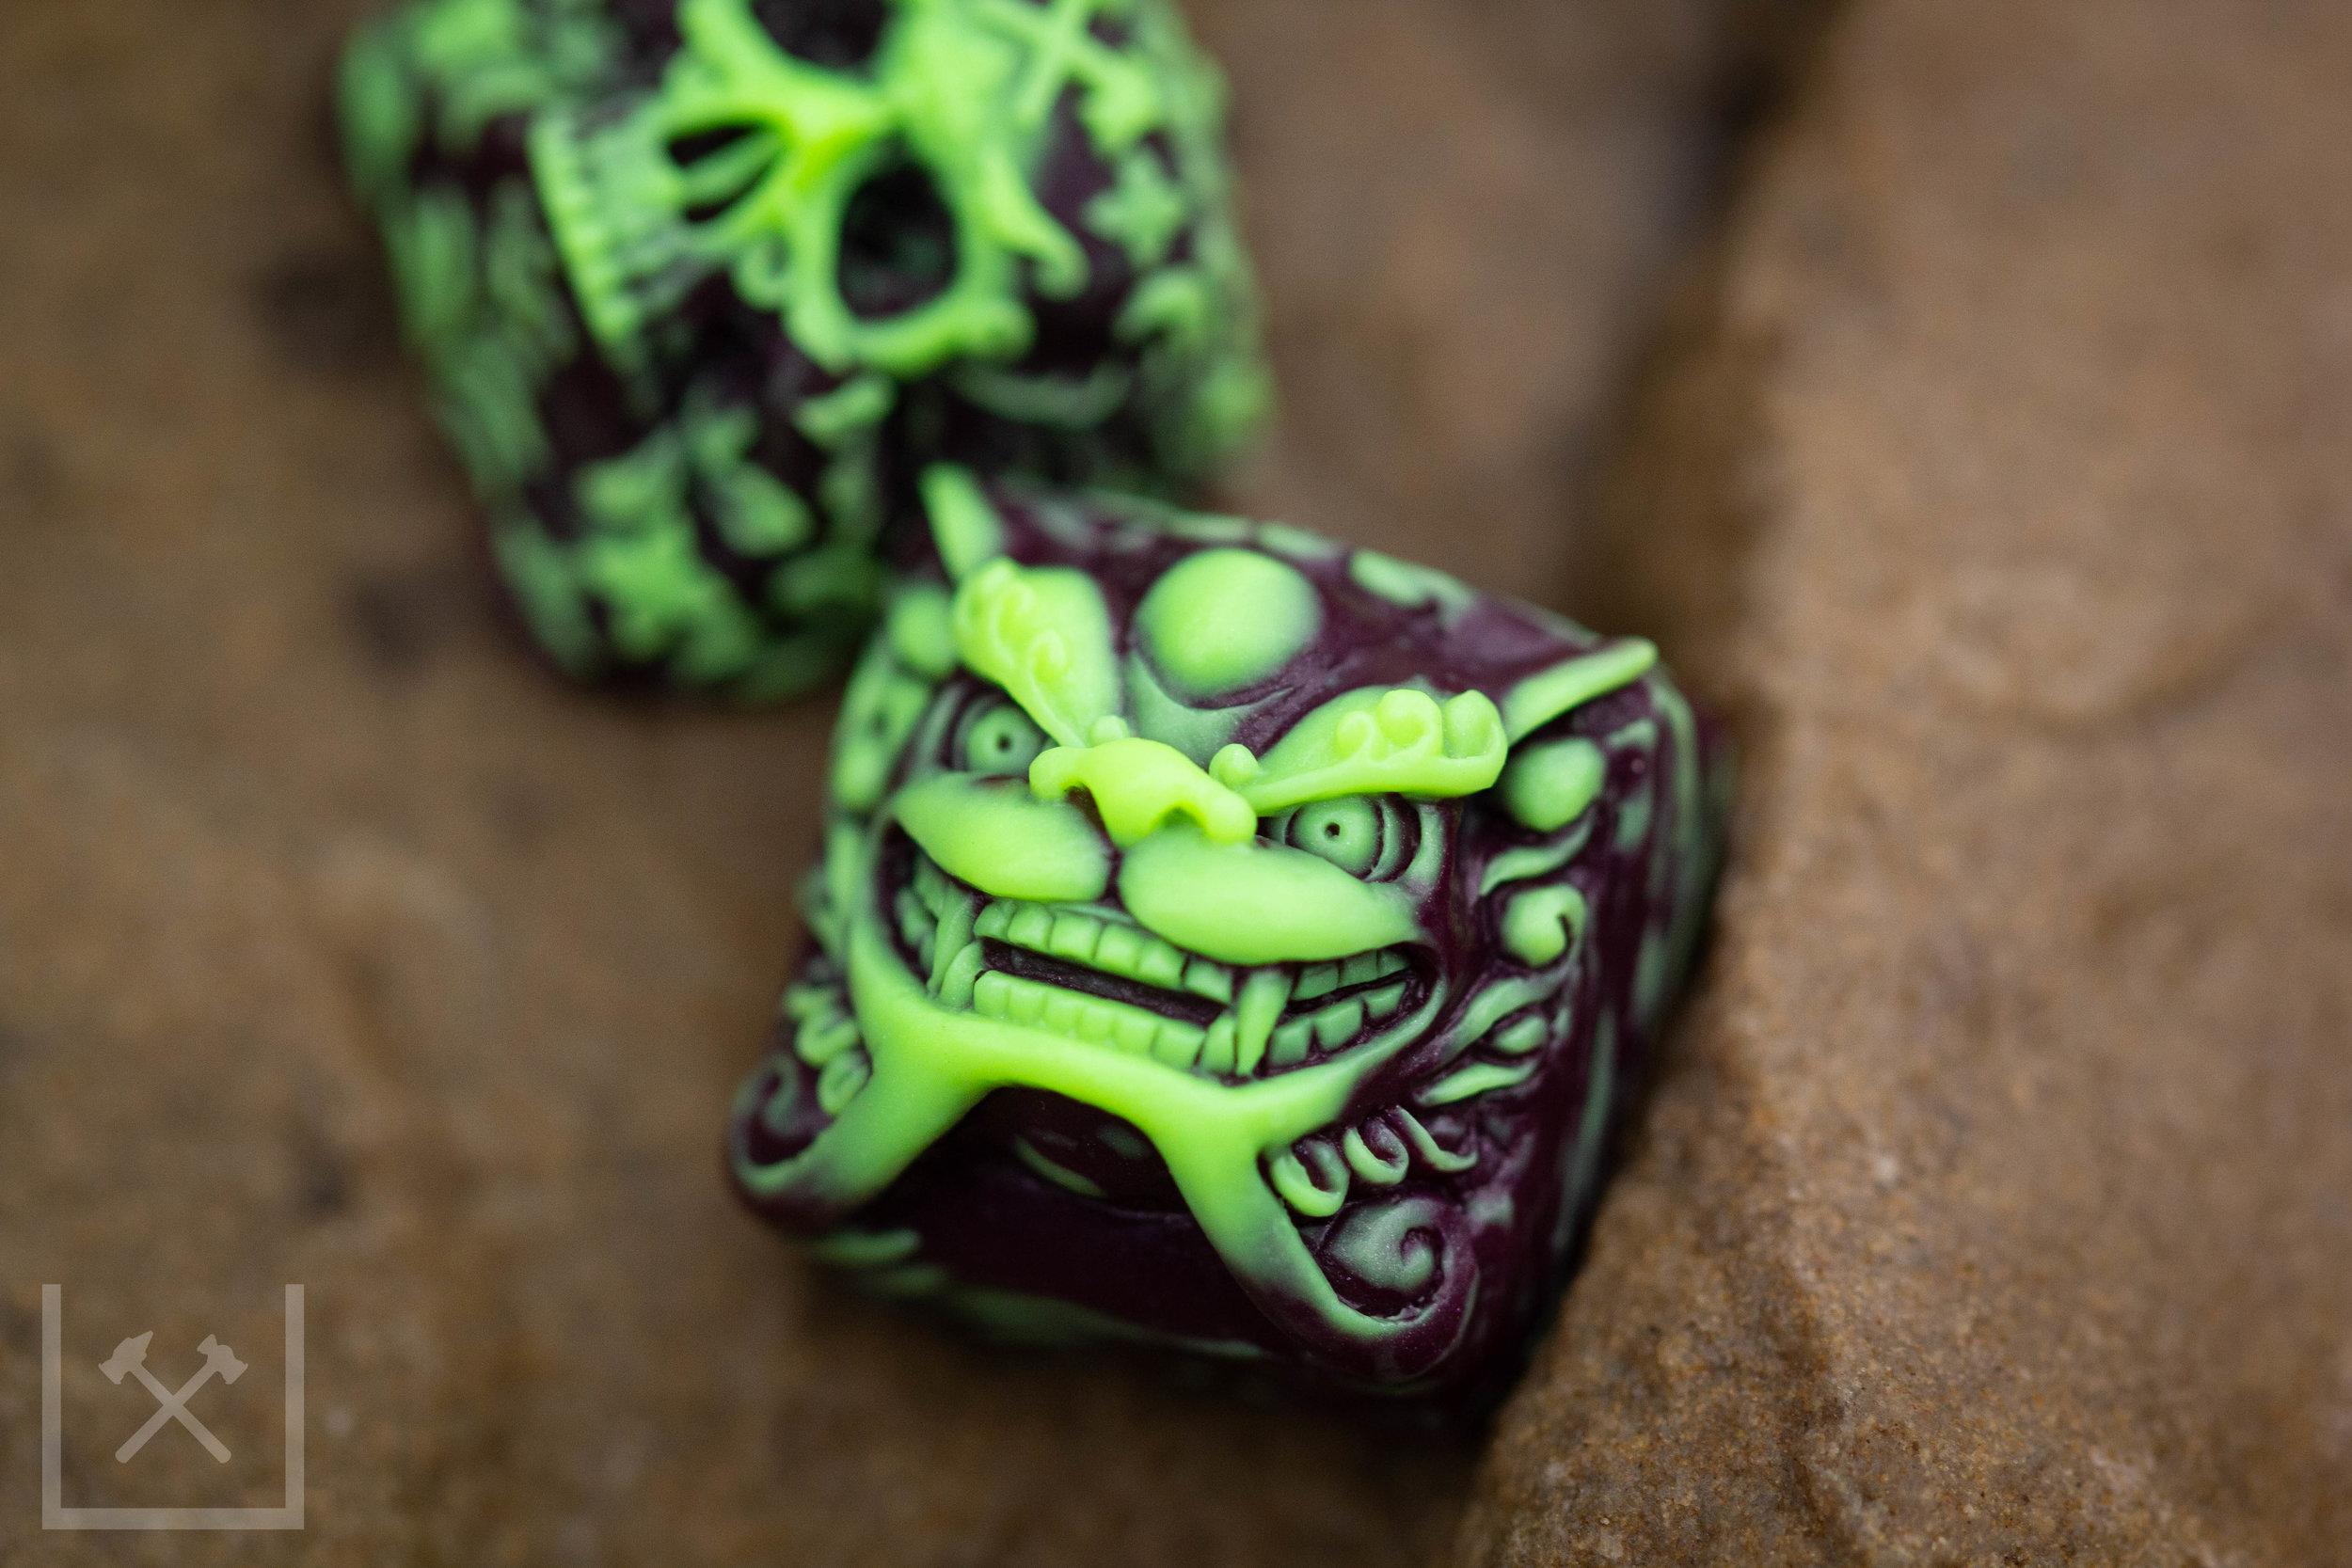 Shishi - Voodoo Avocado